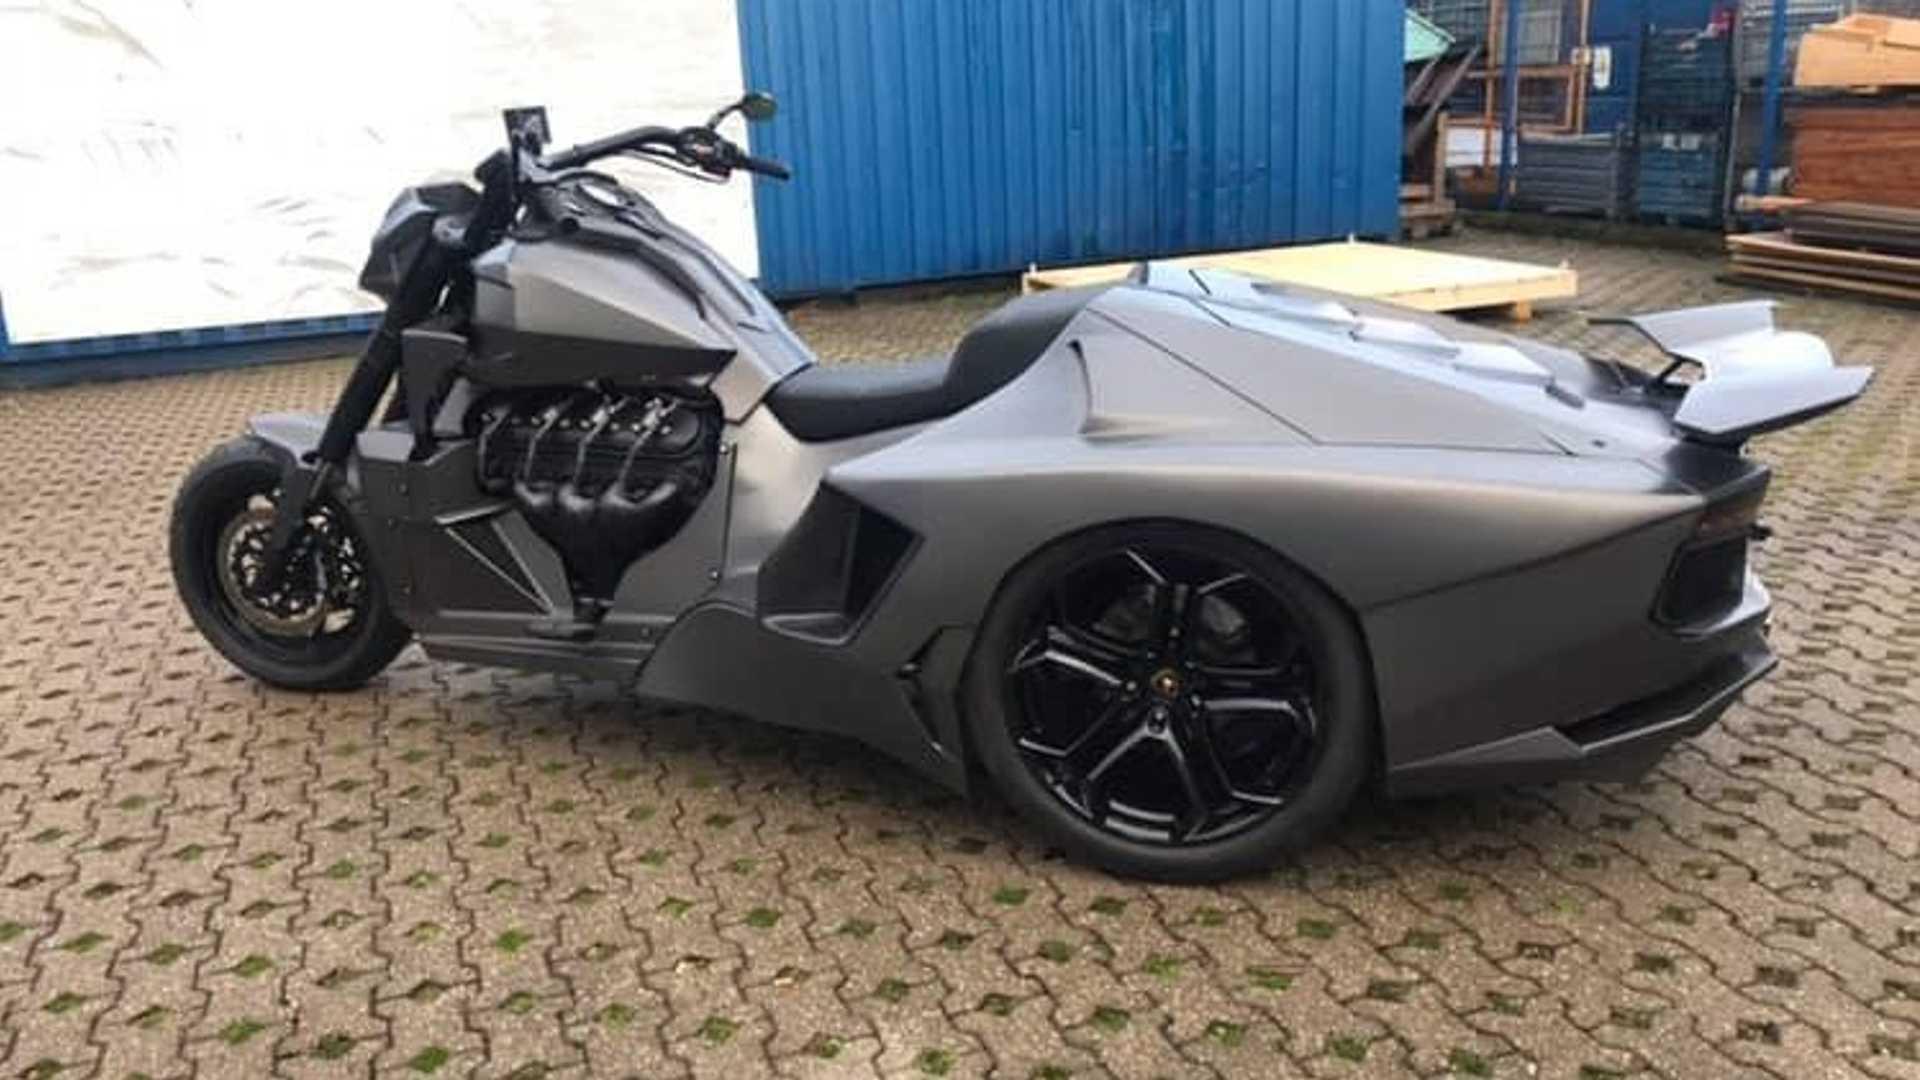 https: img.okezone.com content 2019 03 21 15 2033067 lamborghini-aventador-ini-hanya-memiliki-roda-tiga-uX8GC9upVU.jpg